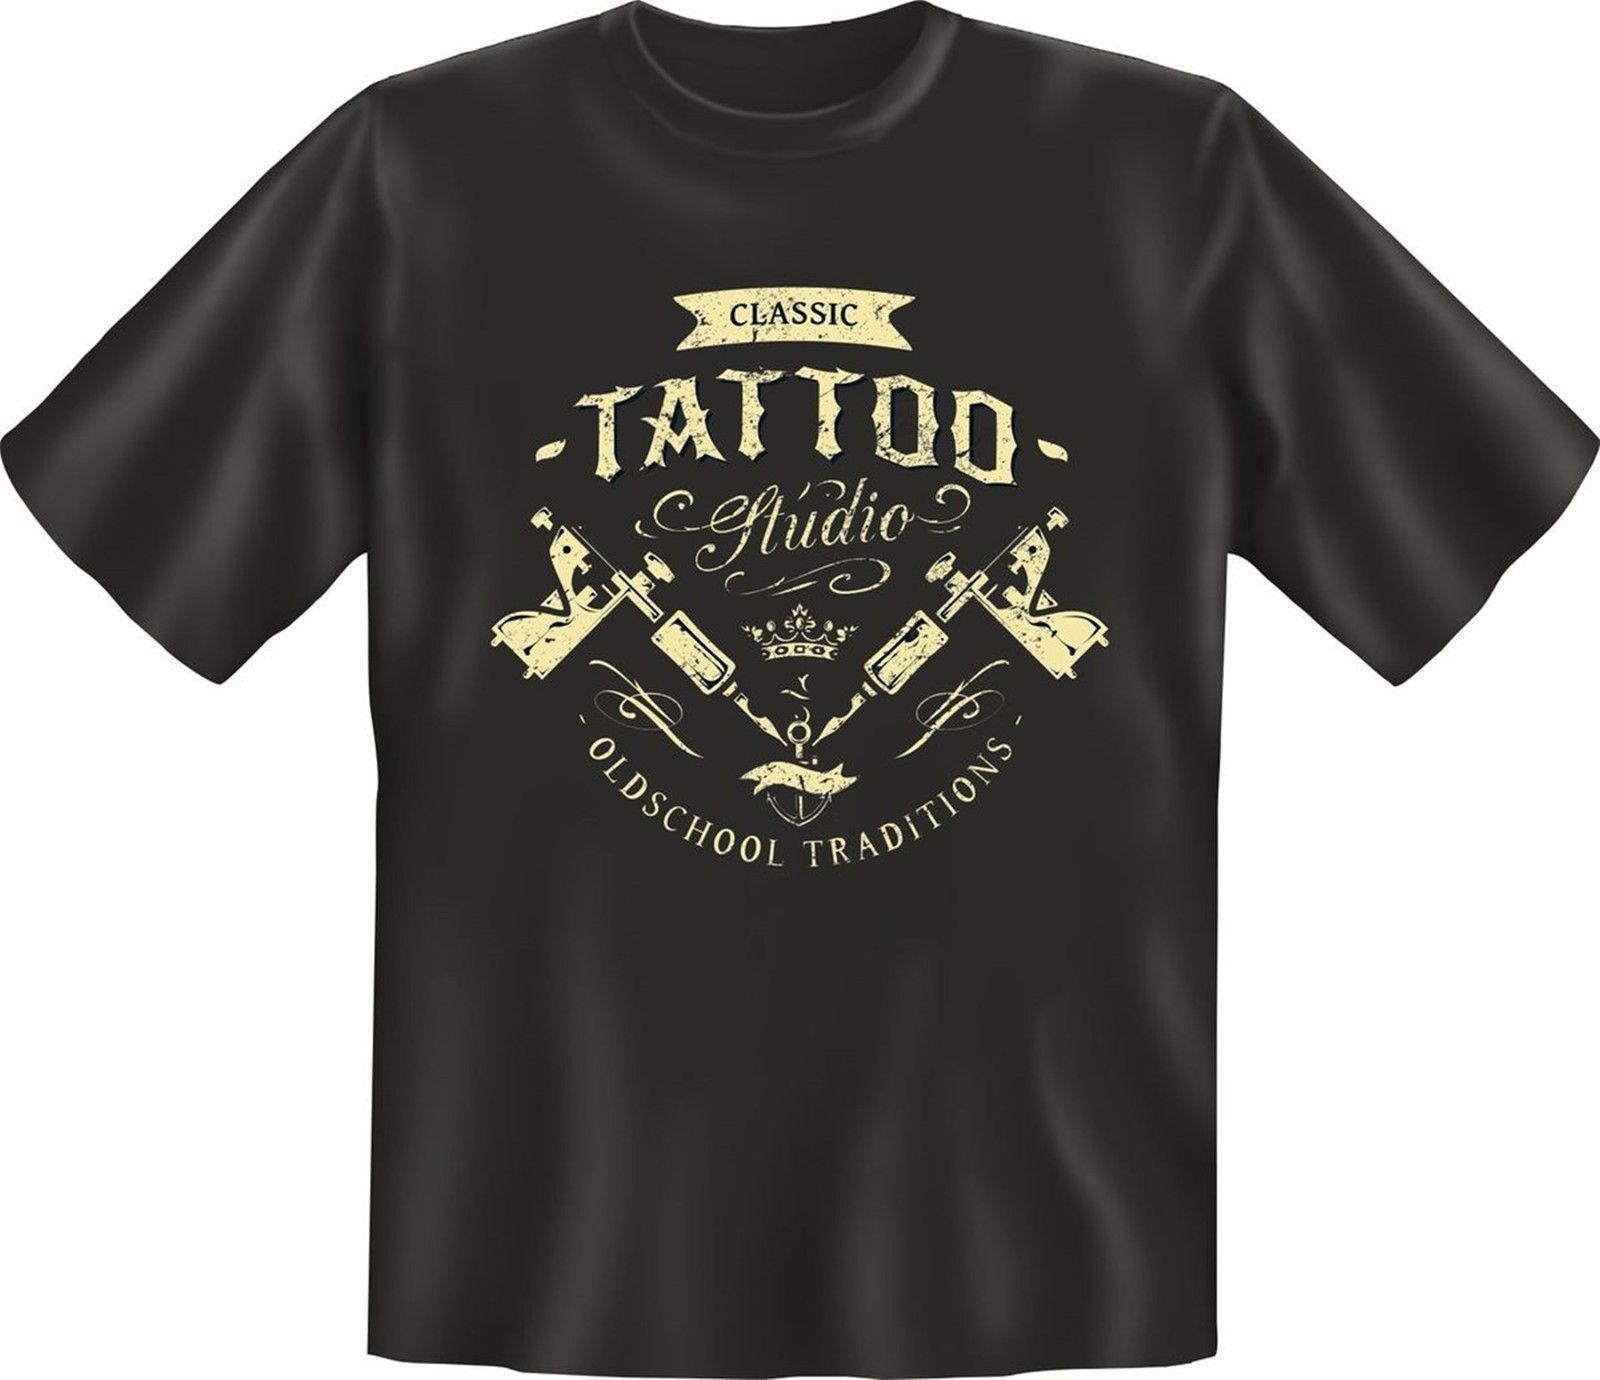 Retro T Shirt Classic Tattoo Studio Geburtstag Geschenk Shirt Geil